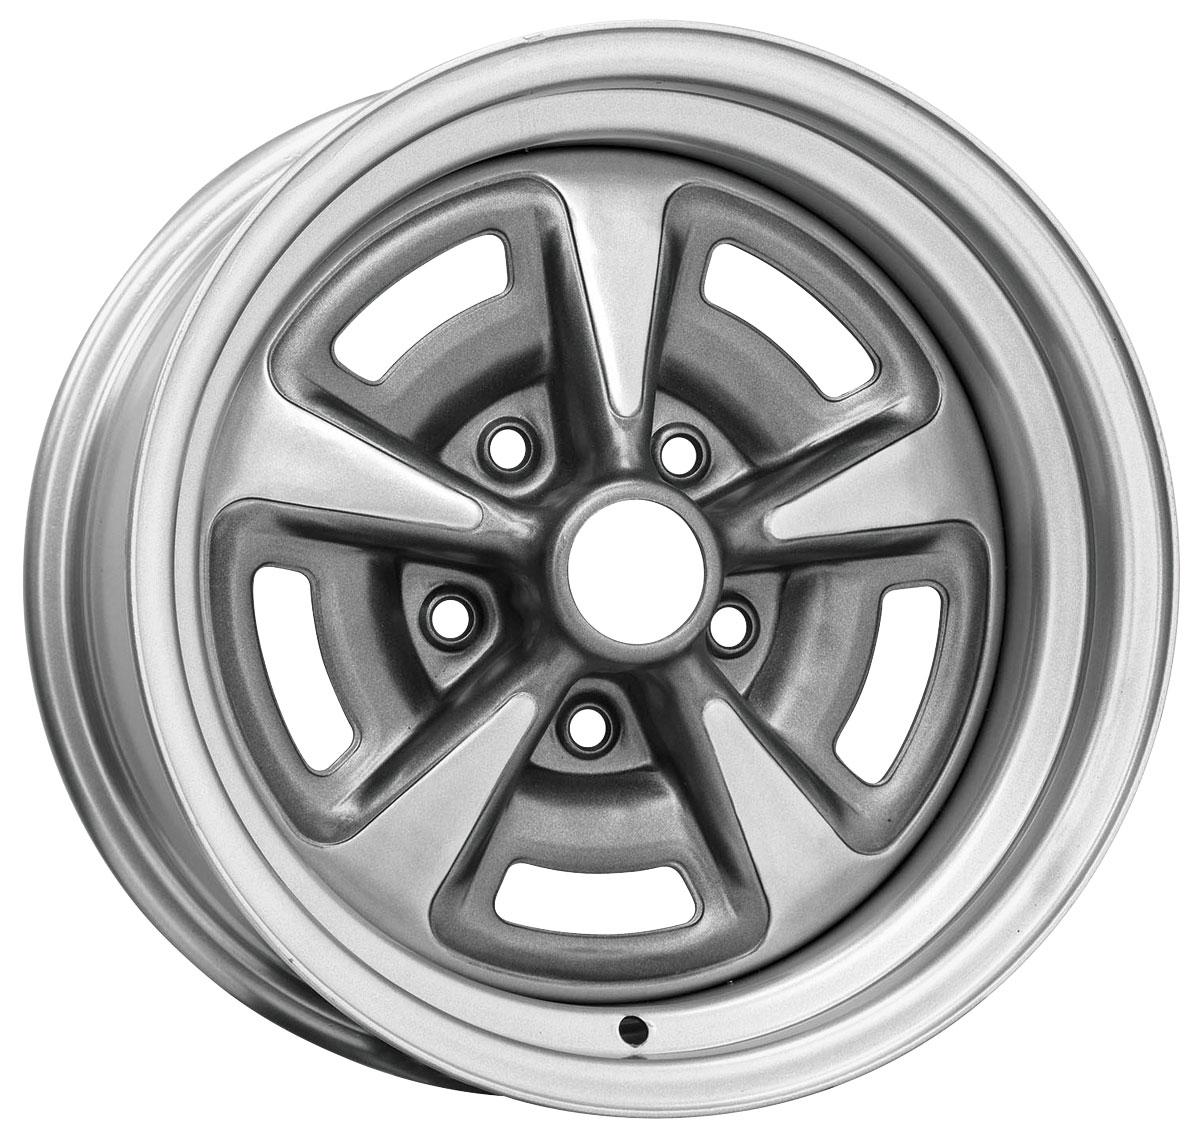 "Wheel, Pontiac Rally II, 15X7, 4-1/4"" Back Spacing"